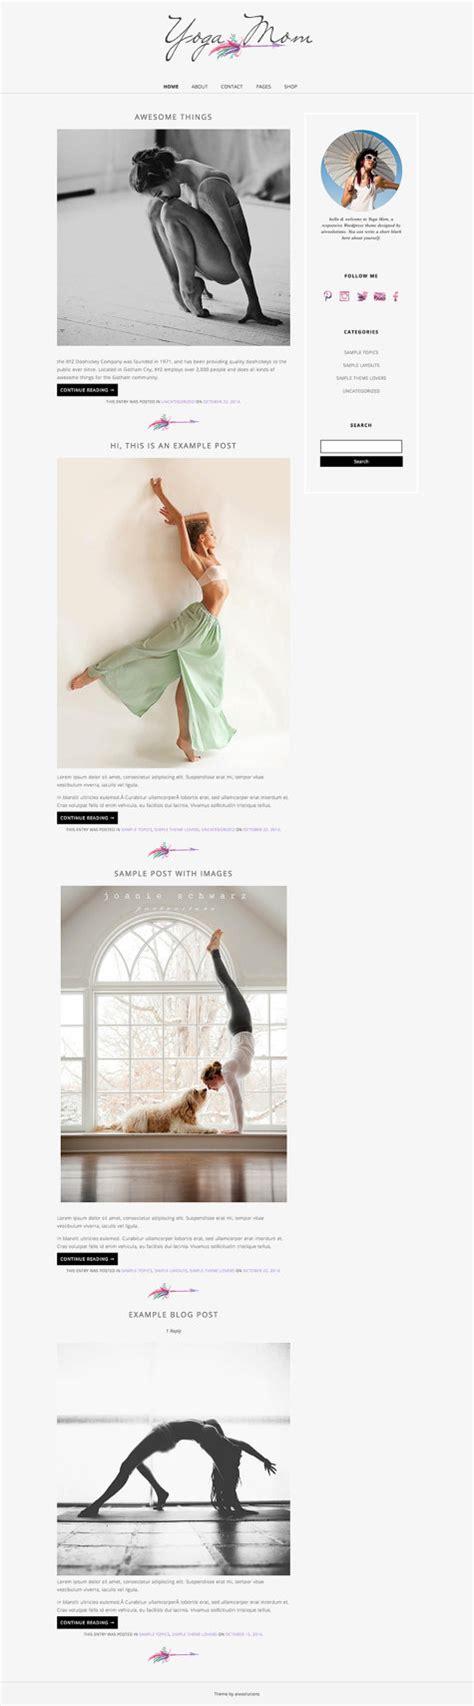 theme blog elegant wordpress template mobile responsive design shop